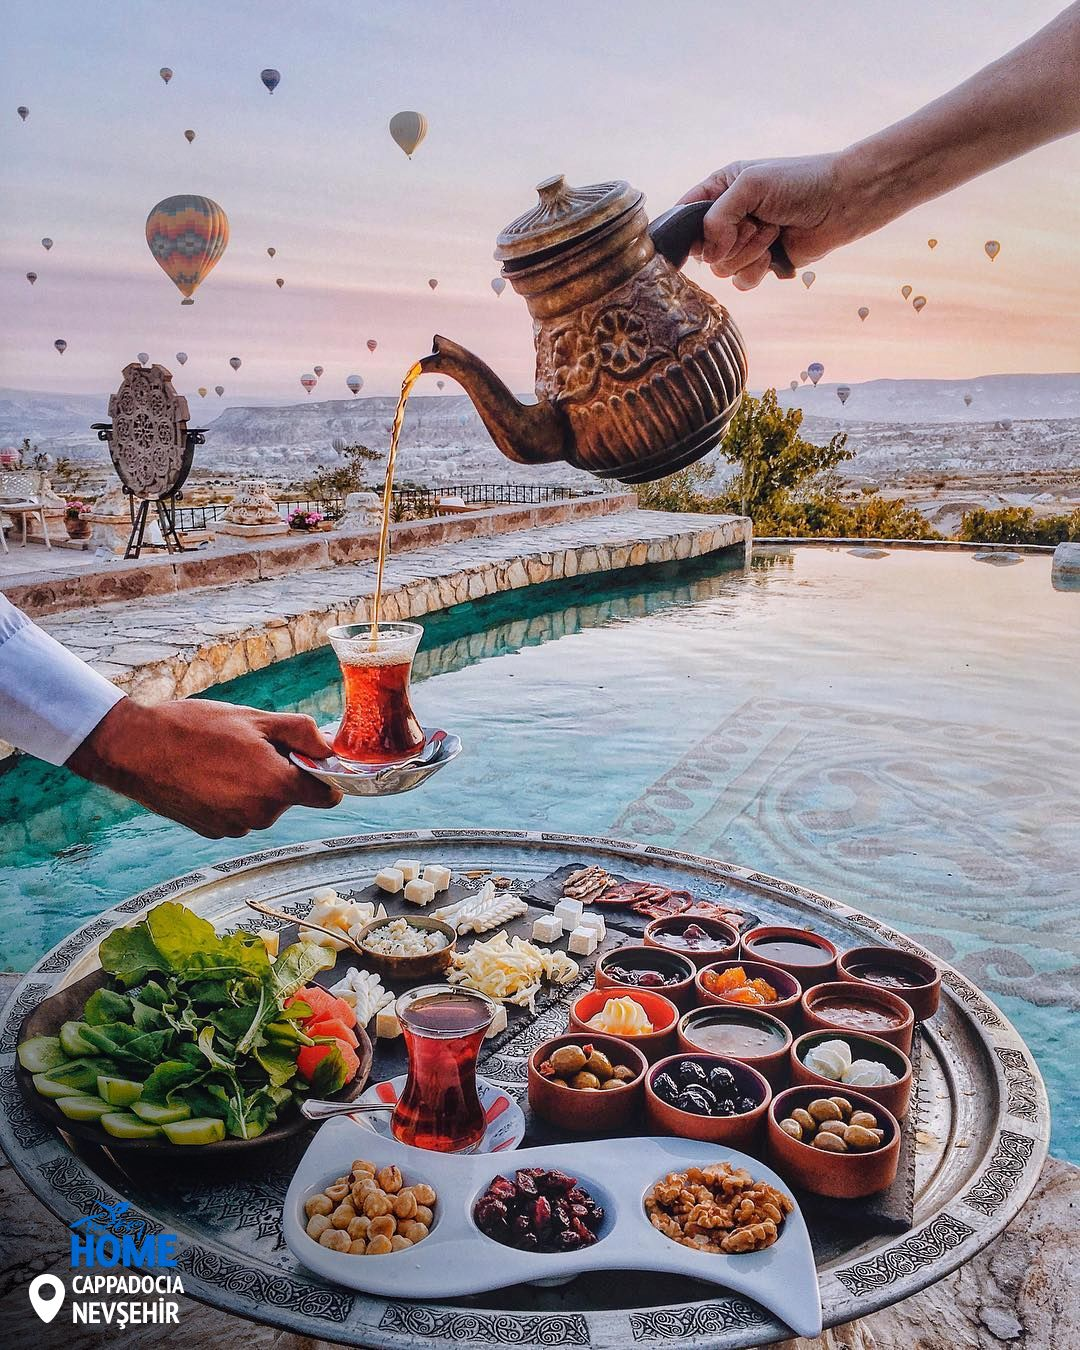 #TurkishTea, #TurkishBreakfast, and a view that is not of this world!  📷 :tiebowtie/IG  #Turkey #Homeof #Cappadocia https://t.co/wF889maRCS